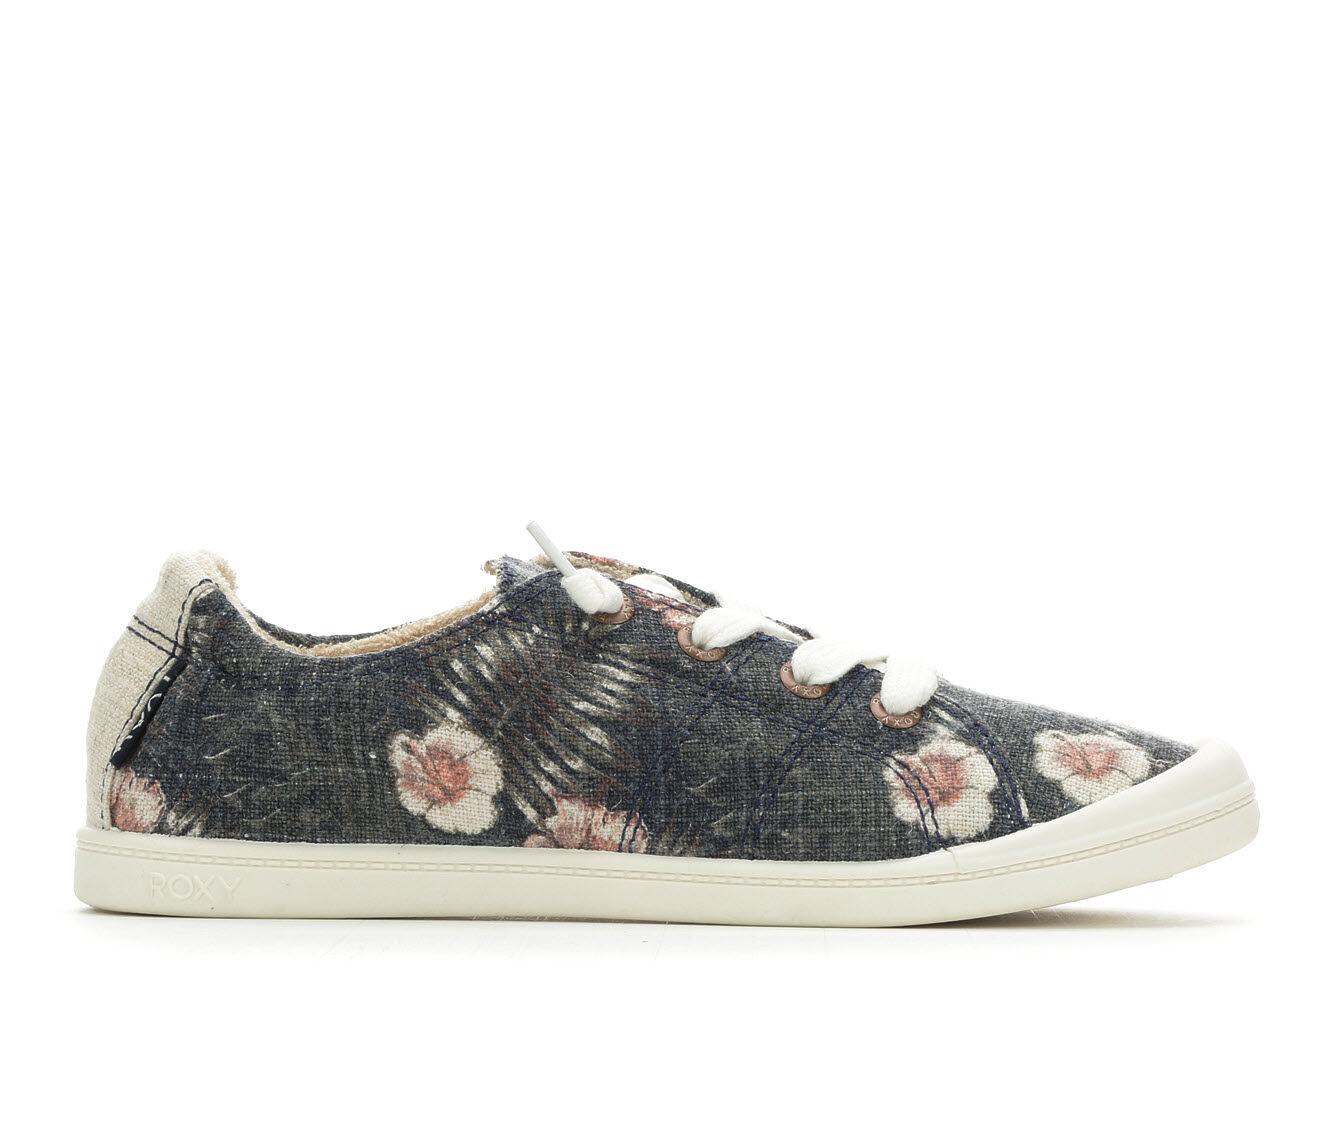 Women's Roxy Bayshore Sneakers Navy Floral